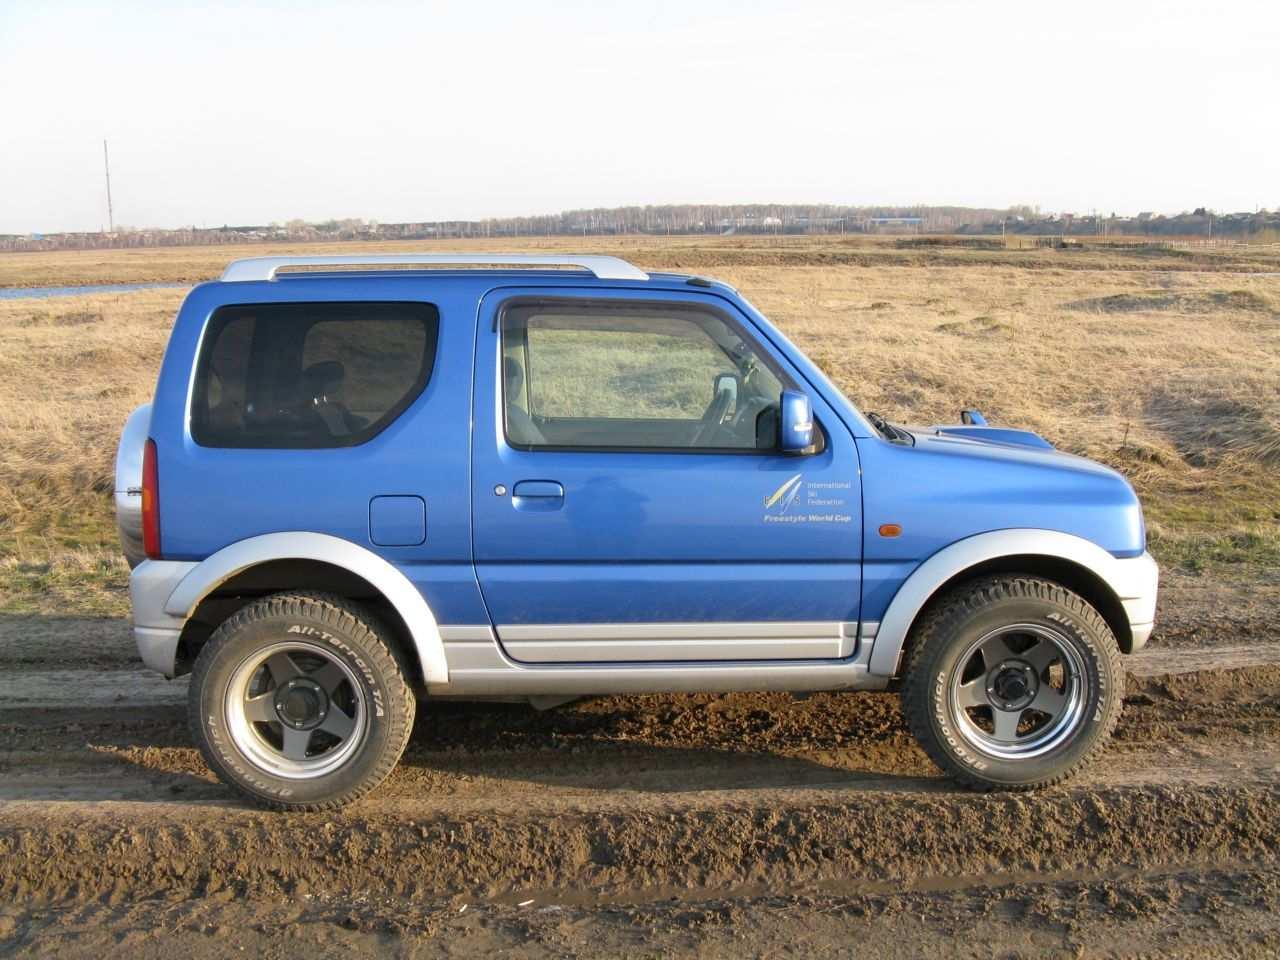 Used Automatic Suzuki Cars For Sale